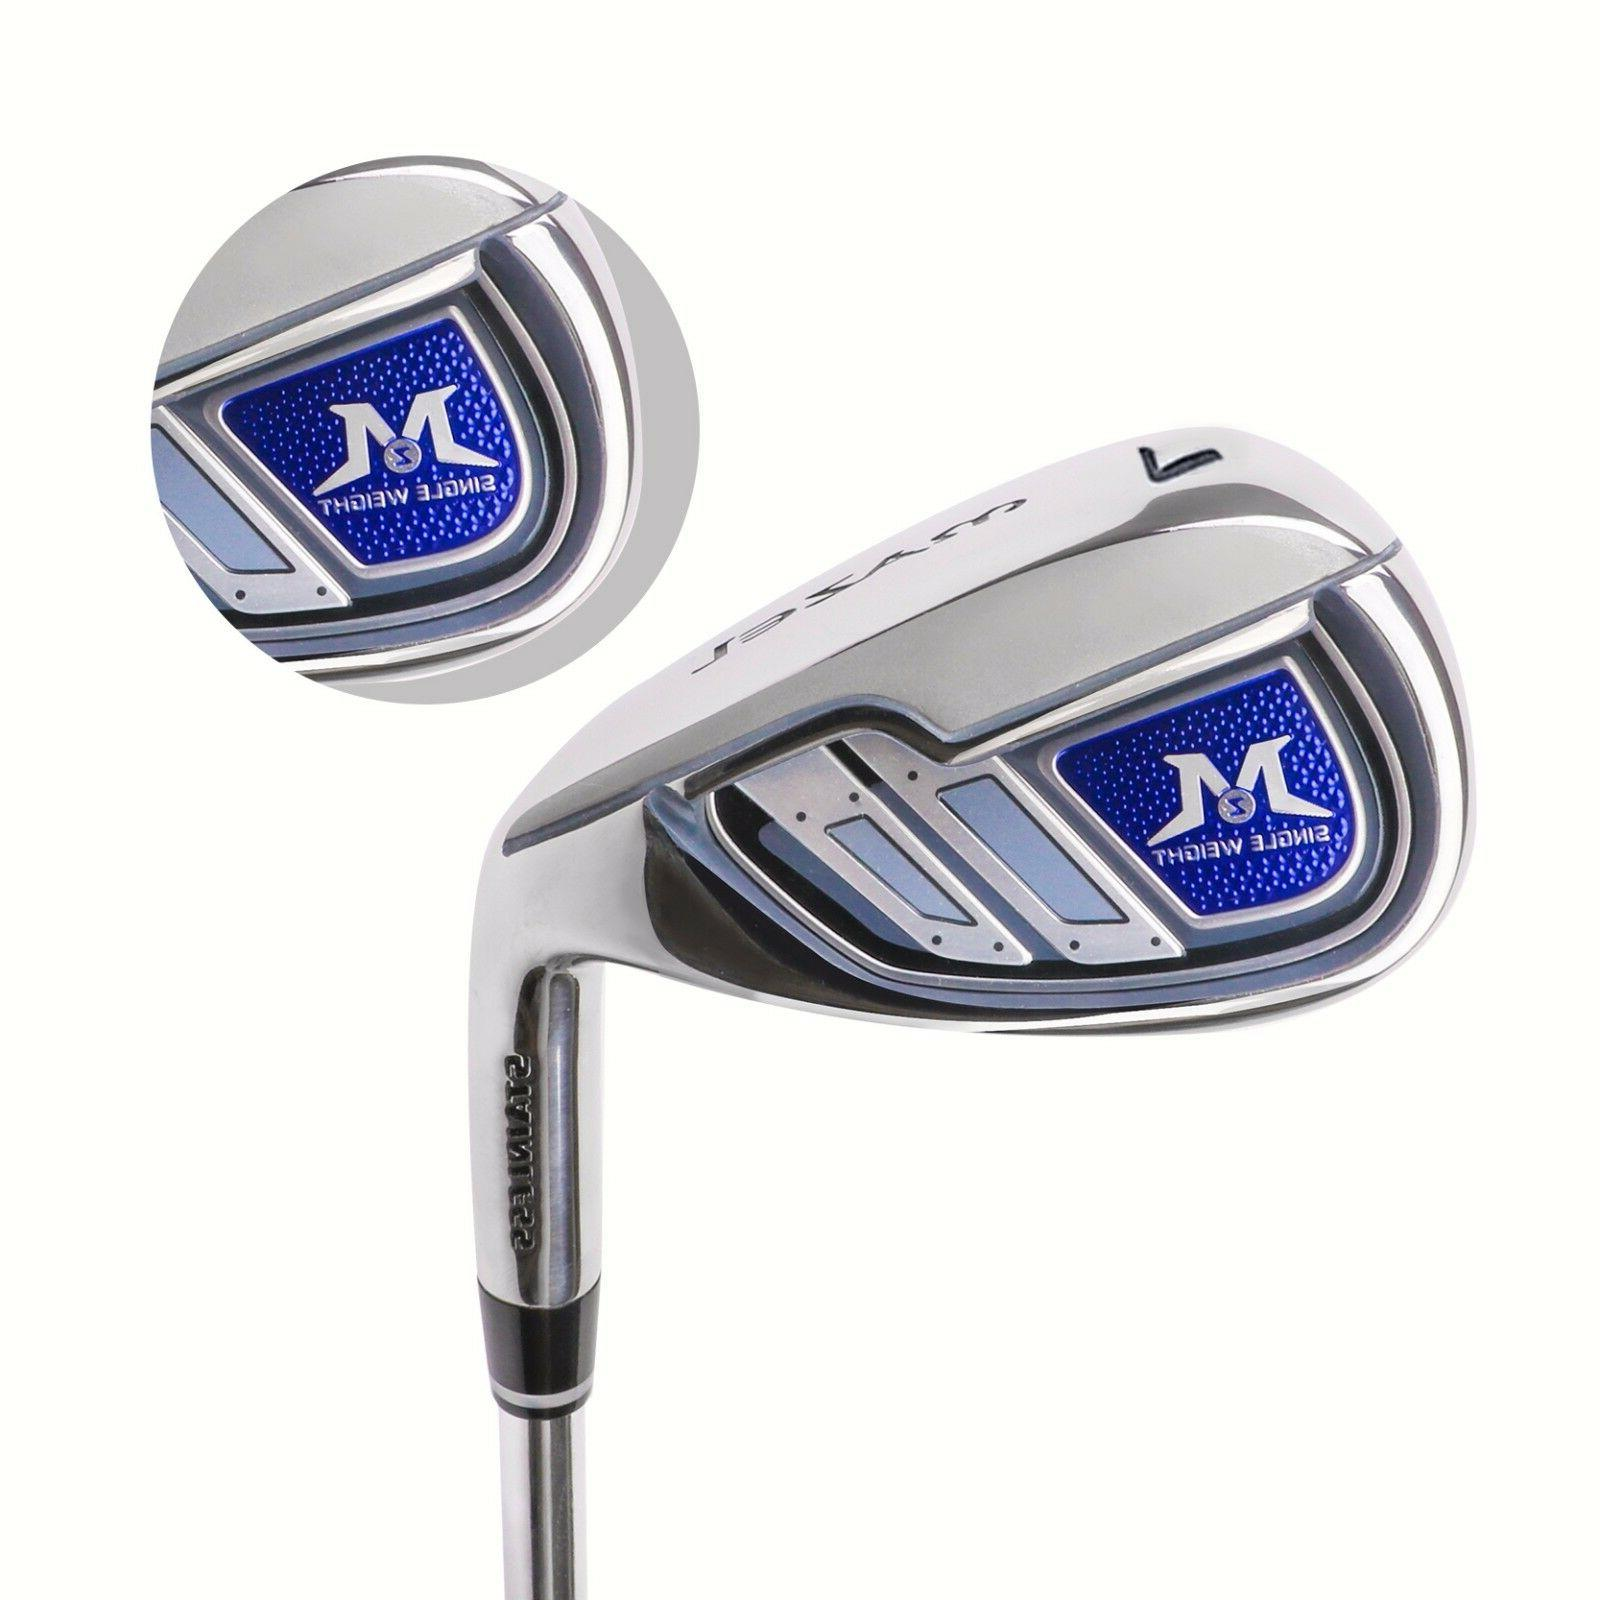 Mazel Iron Golf For Men Single 37.5''RH